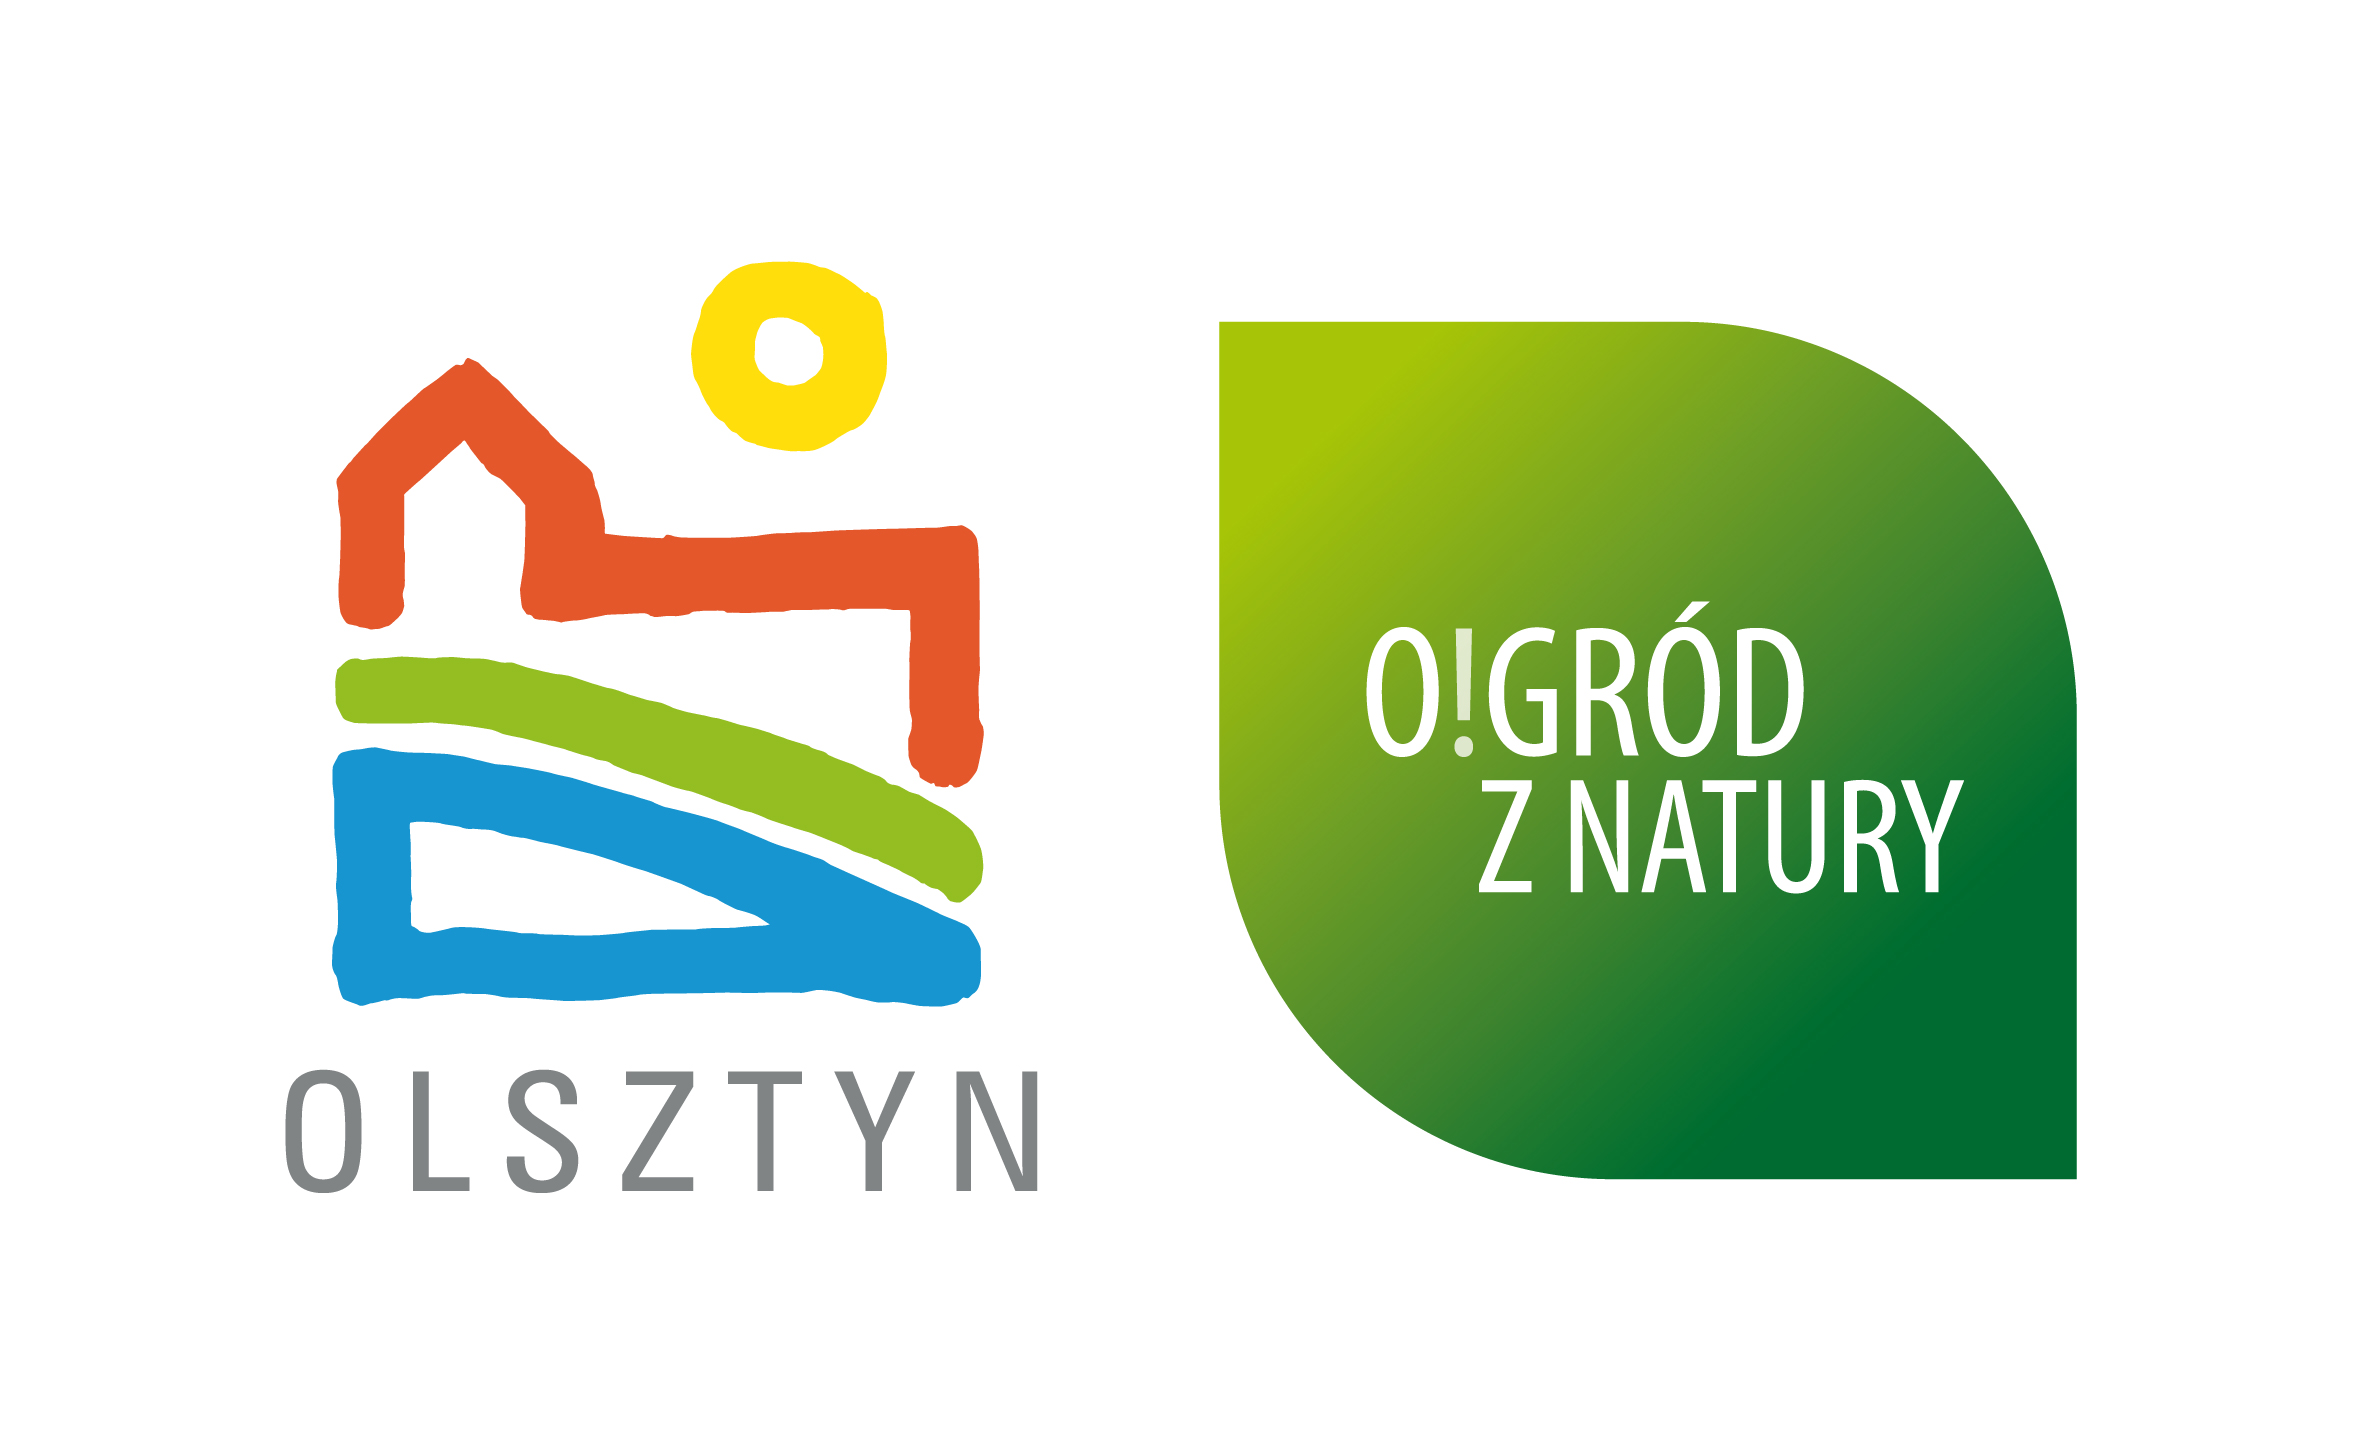 http://m.wmwm.pl/2016/06/orig/logo-z-listkiem-5327.jpg